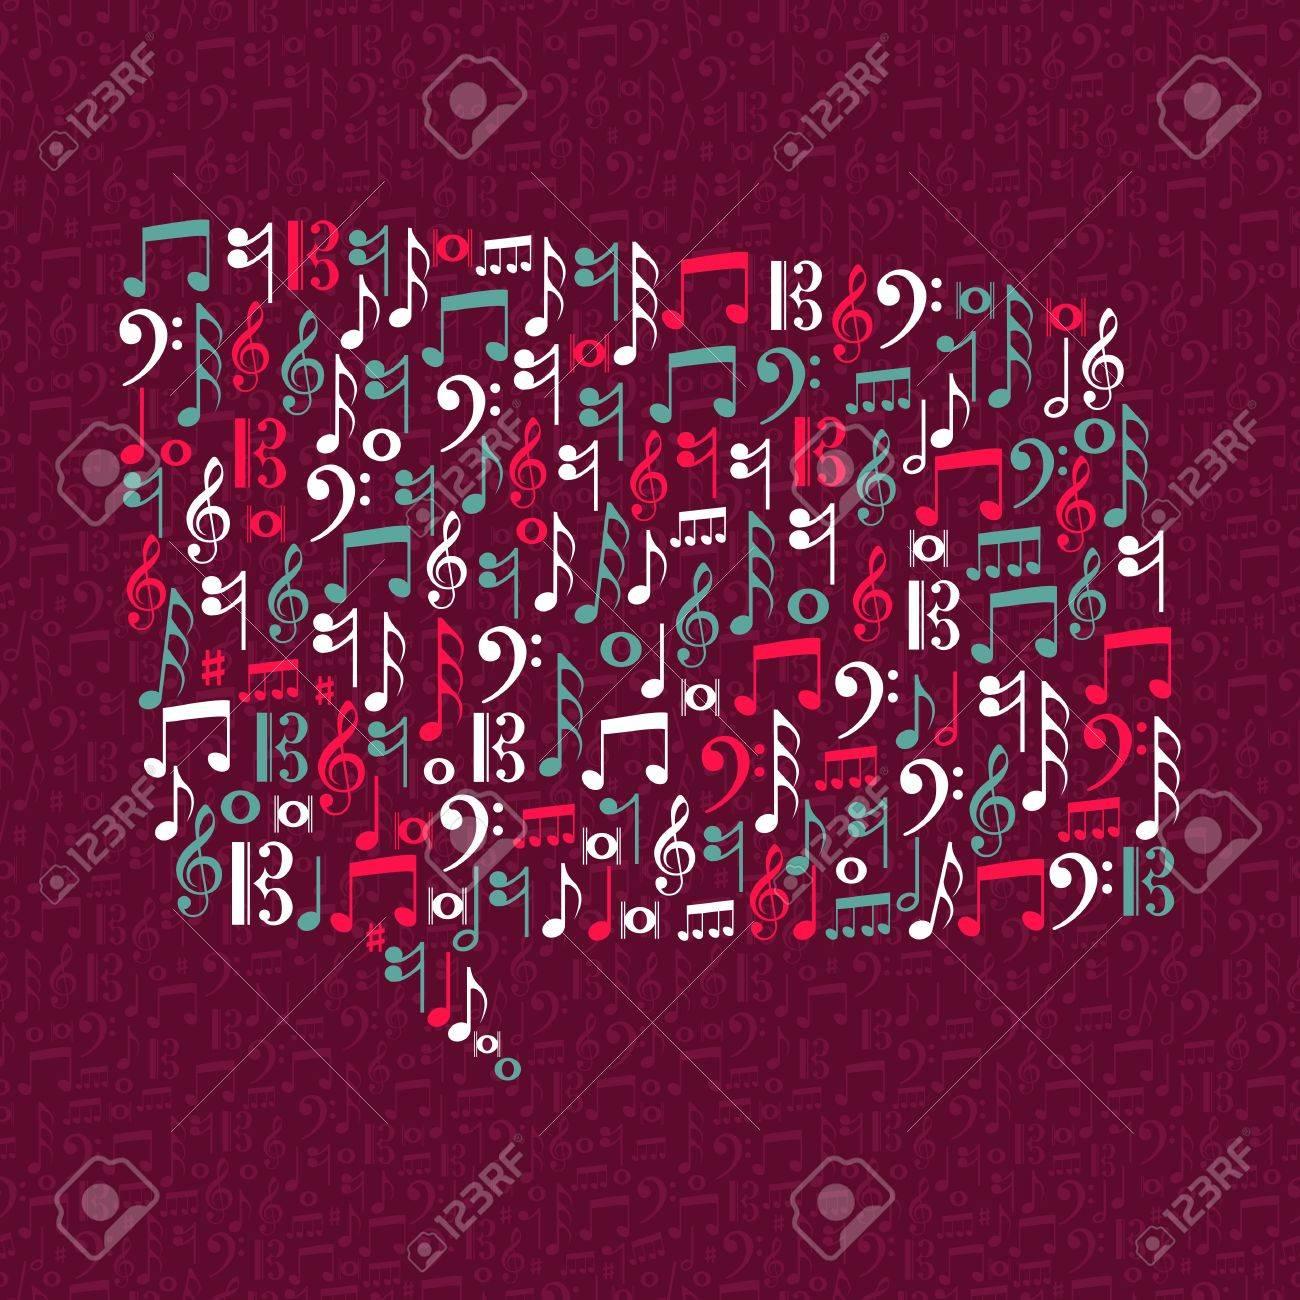 Social media bubble shape, music notes illustration. Stock Vector - 21280329